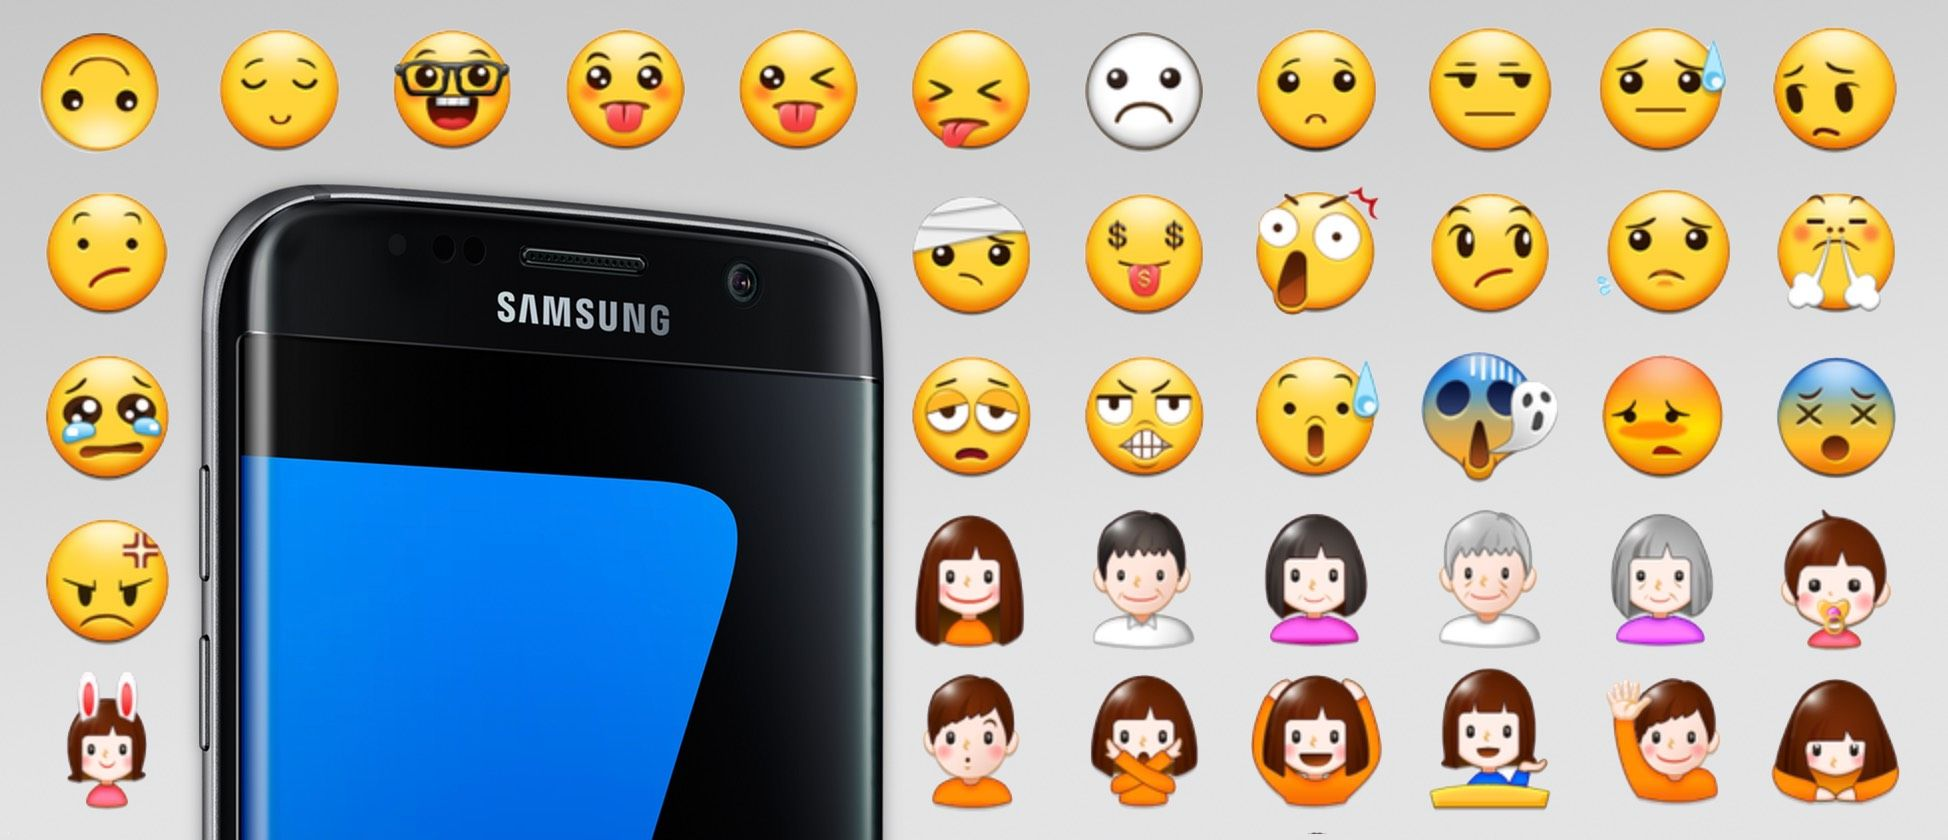 Samsung Galaxy S7 Emoji Changelog